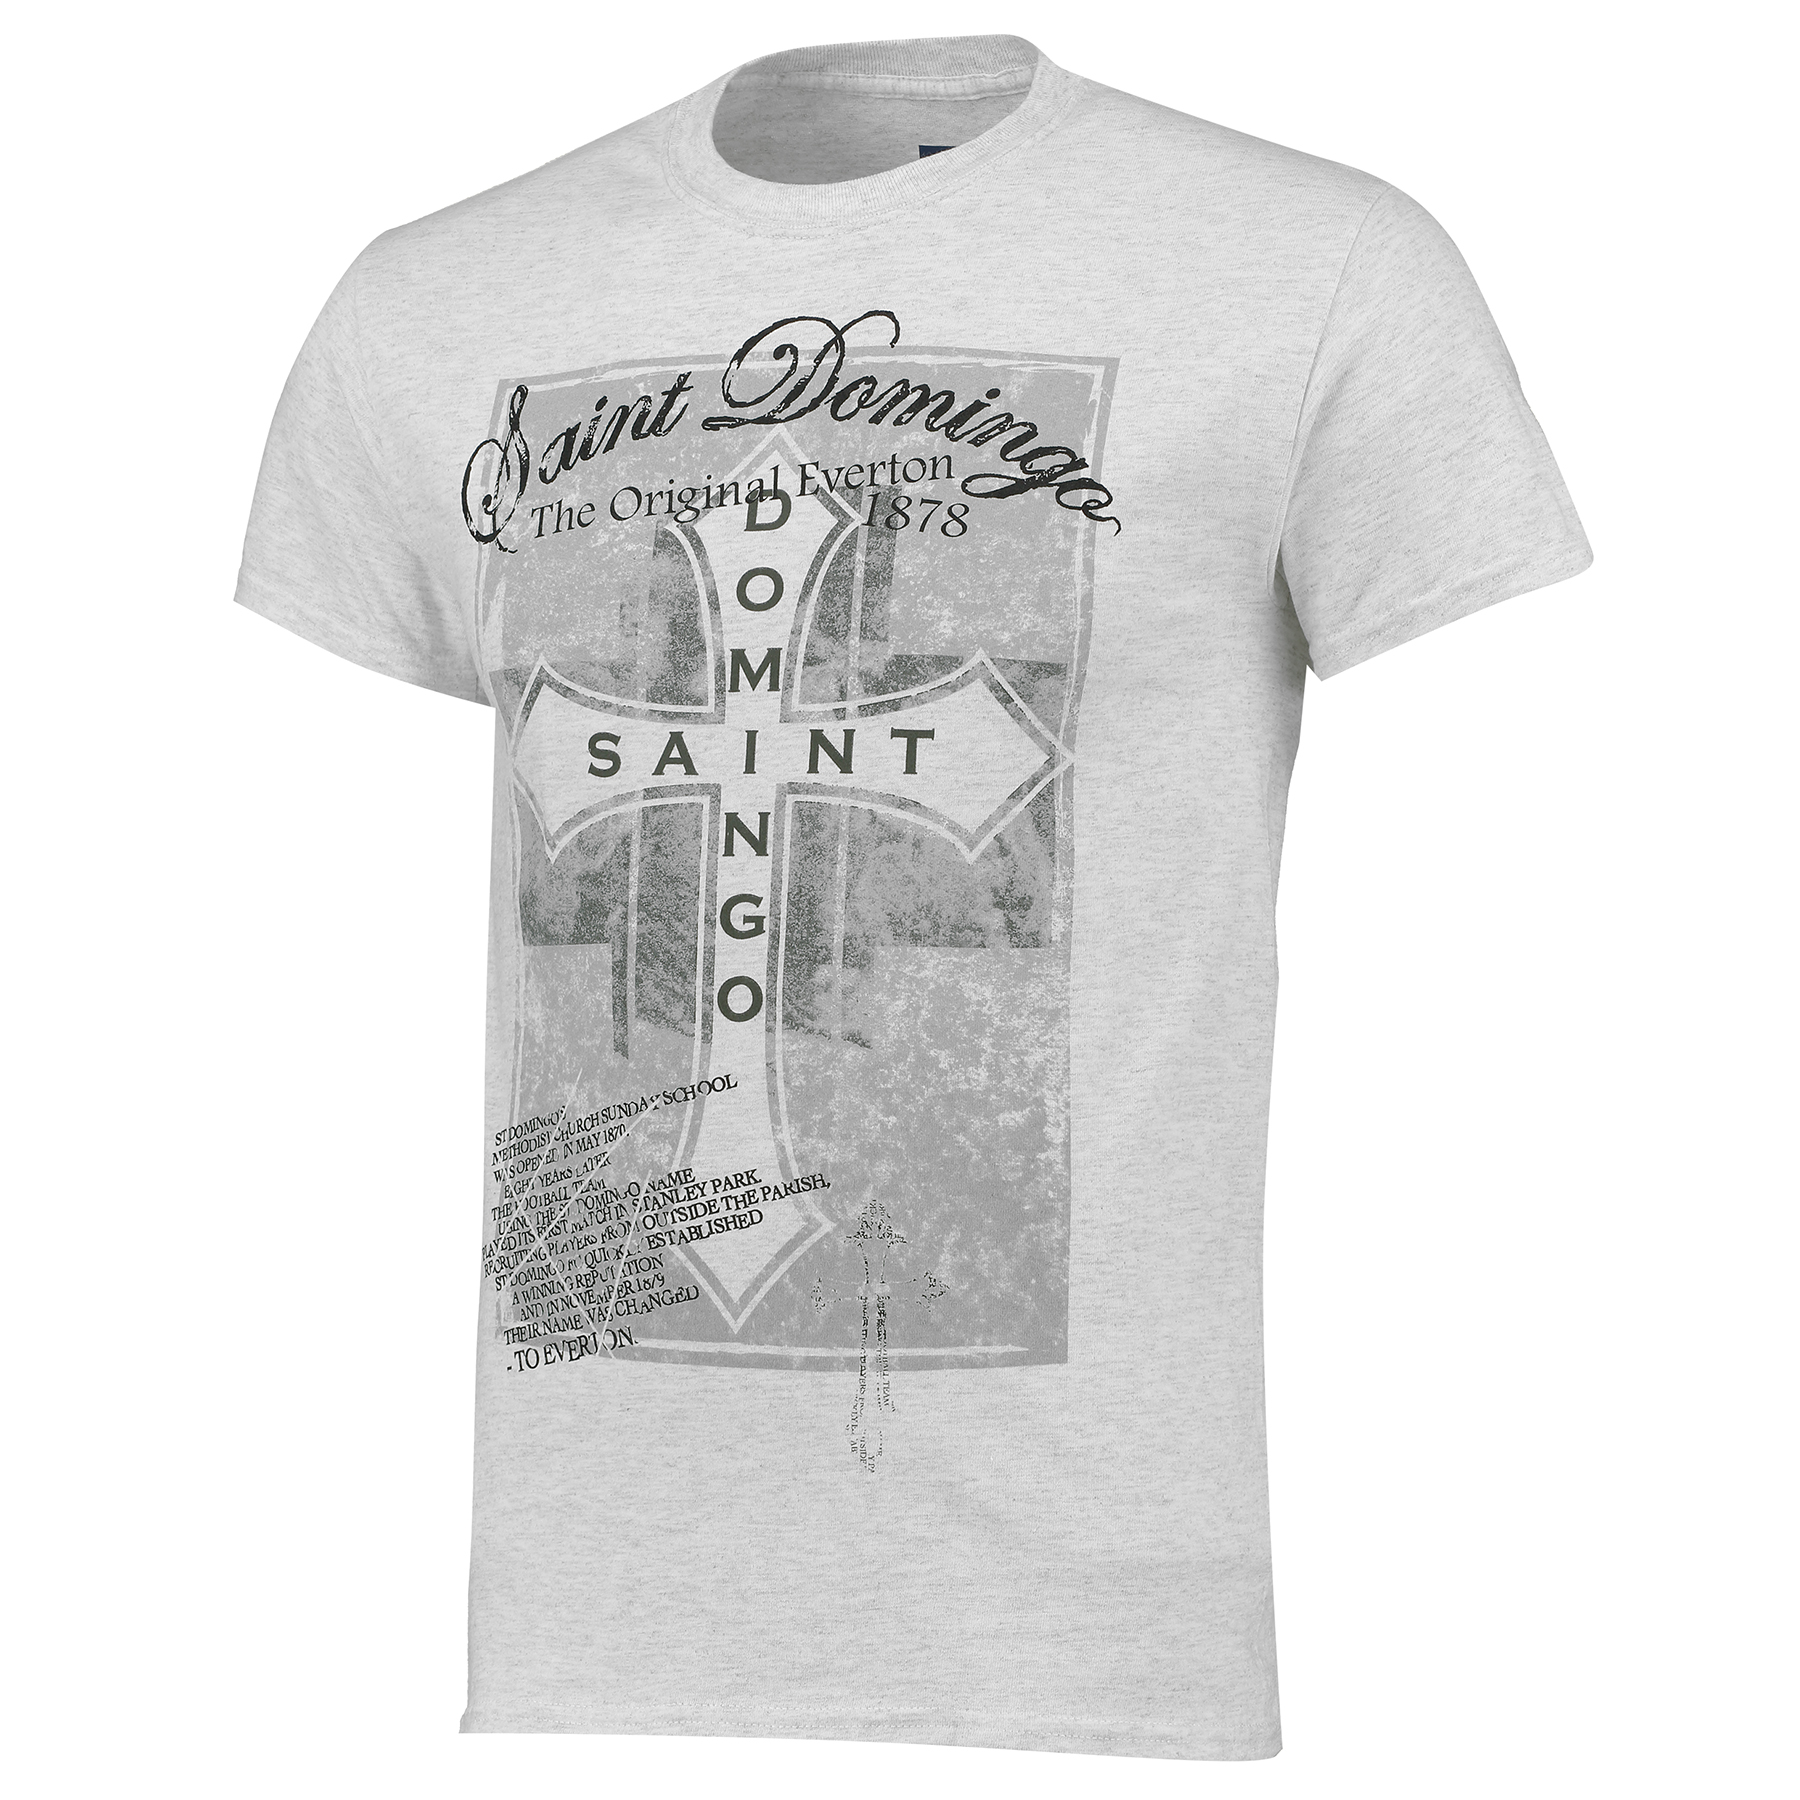 Everton 2for20 St Domingo T-Shirt - Light Grey